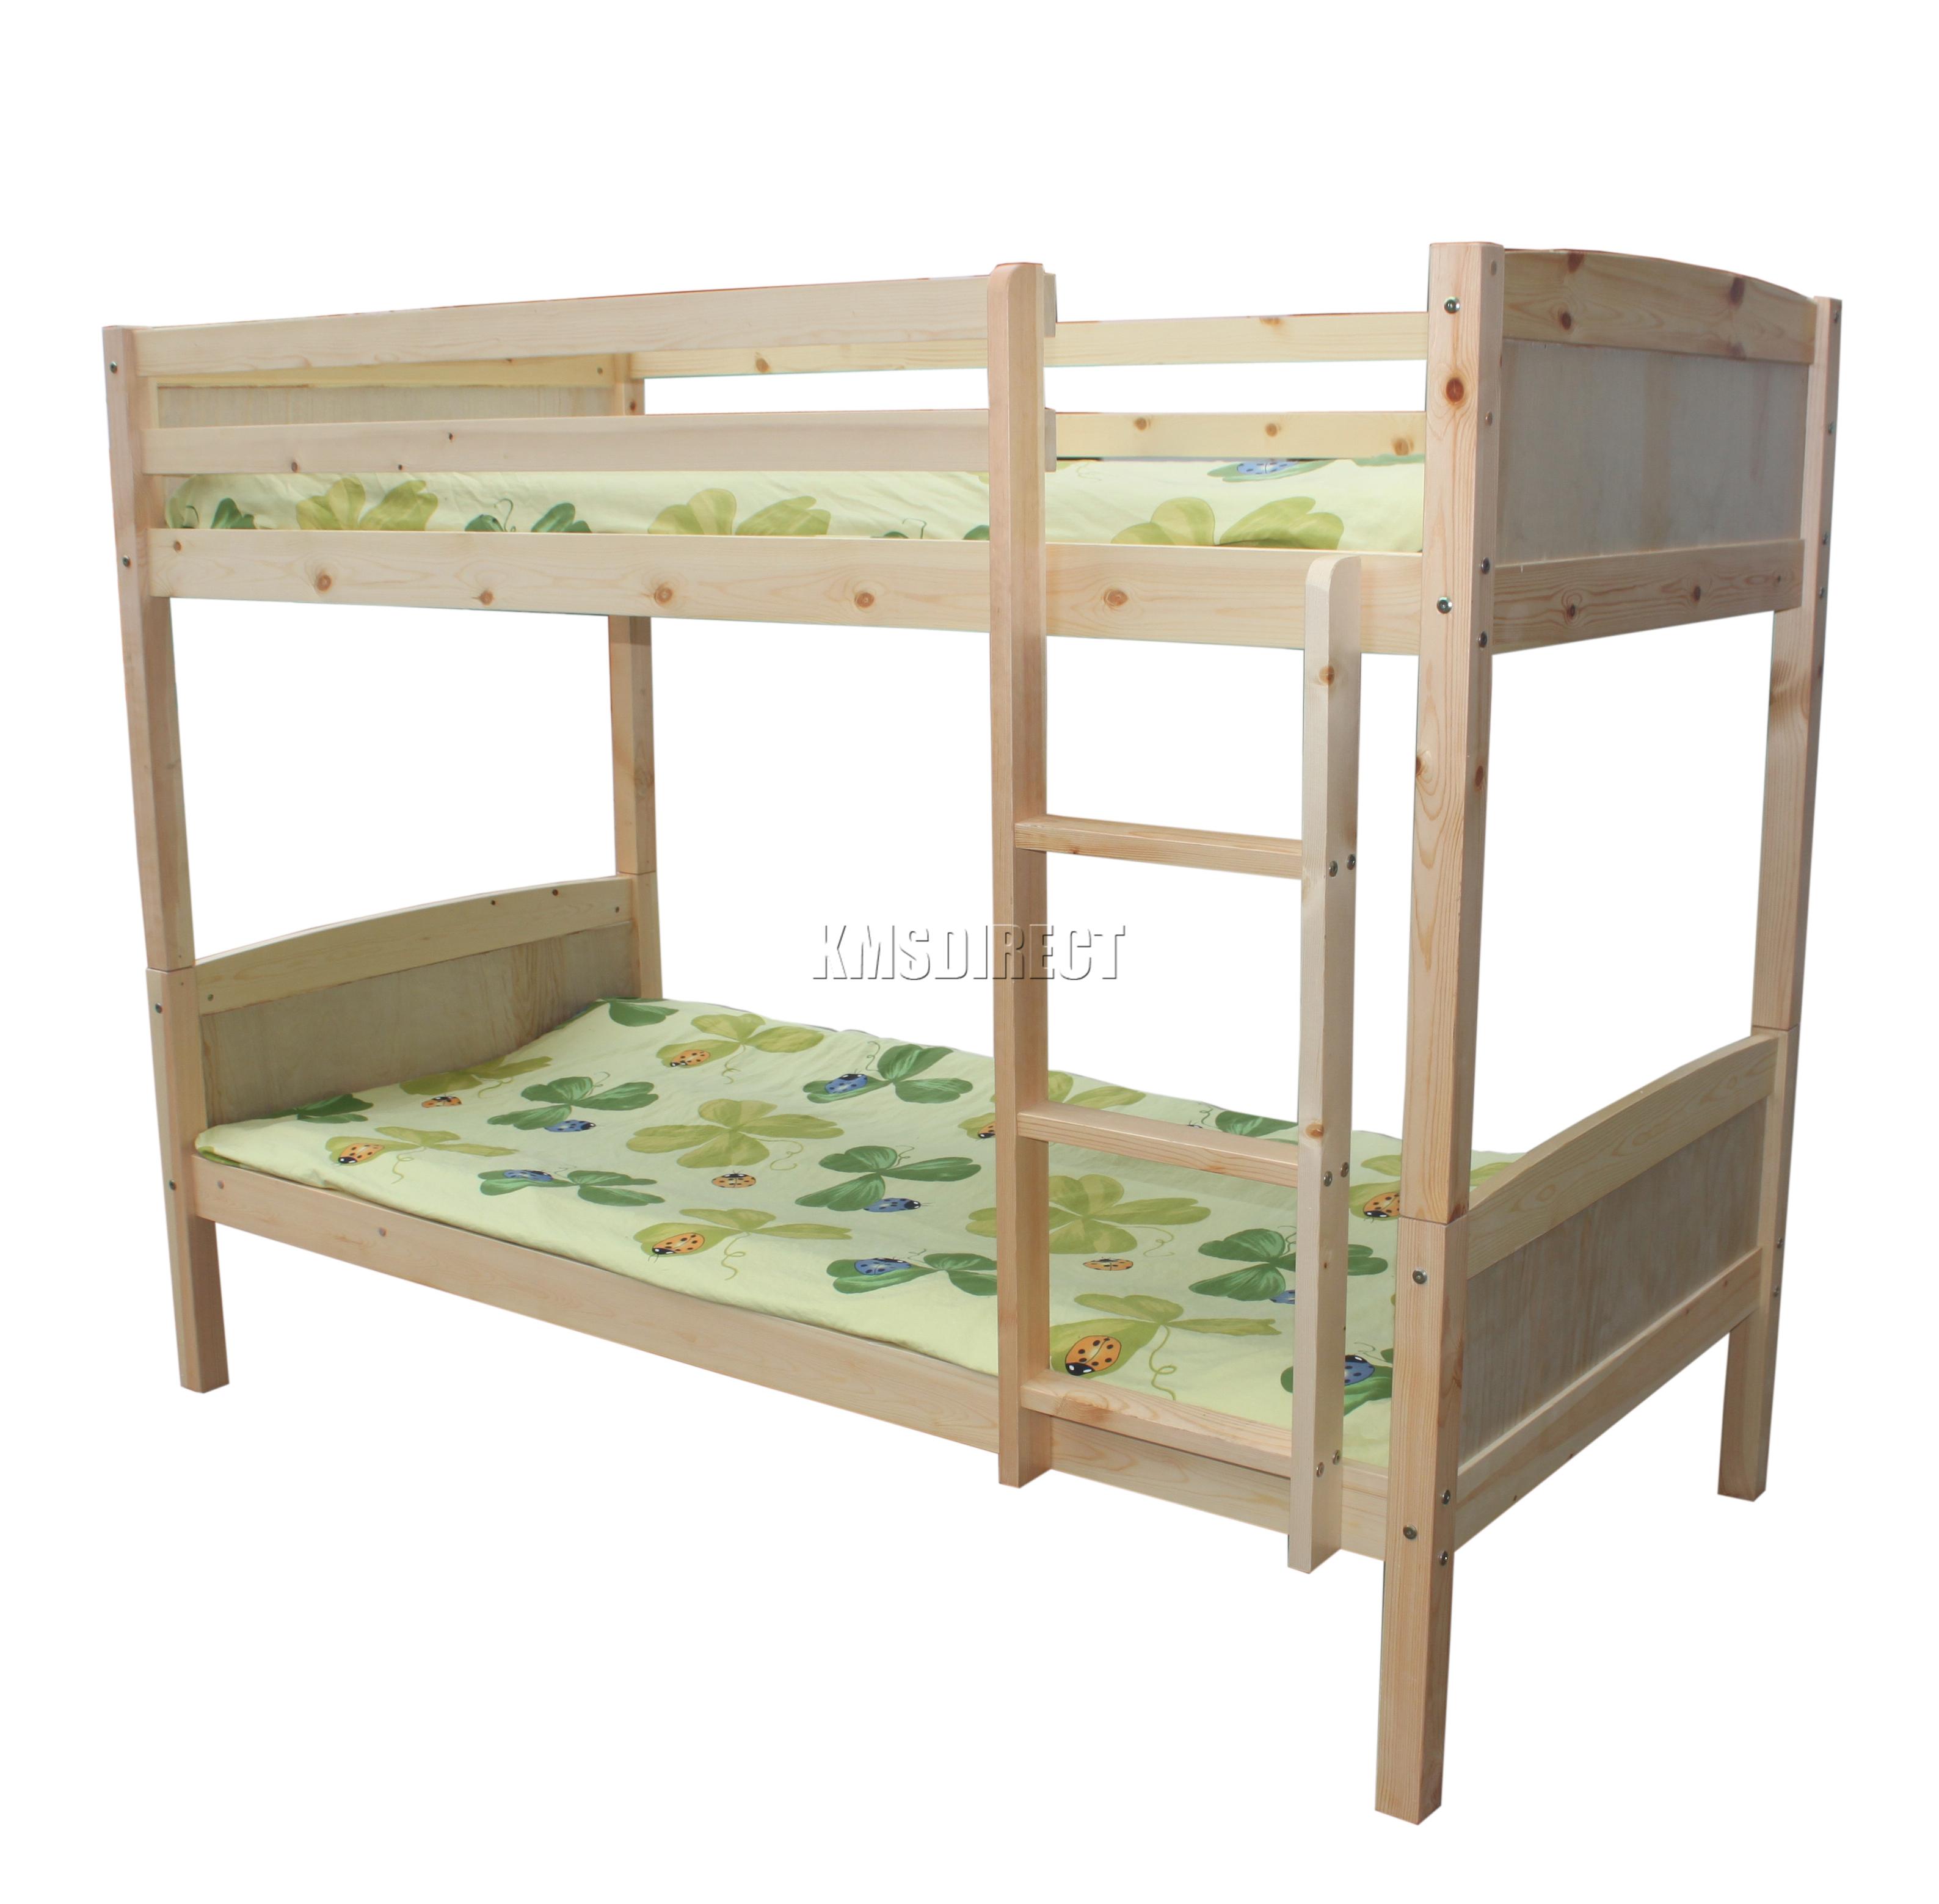 Foxhunter new 3ft wooden frame bunk bed children sleeper for Single bunk bed frame